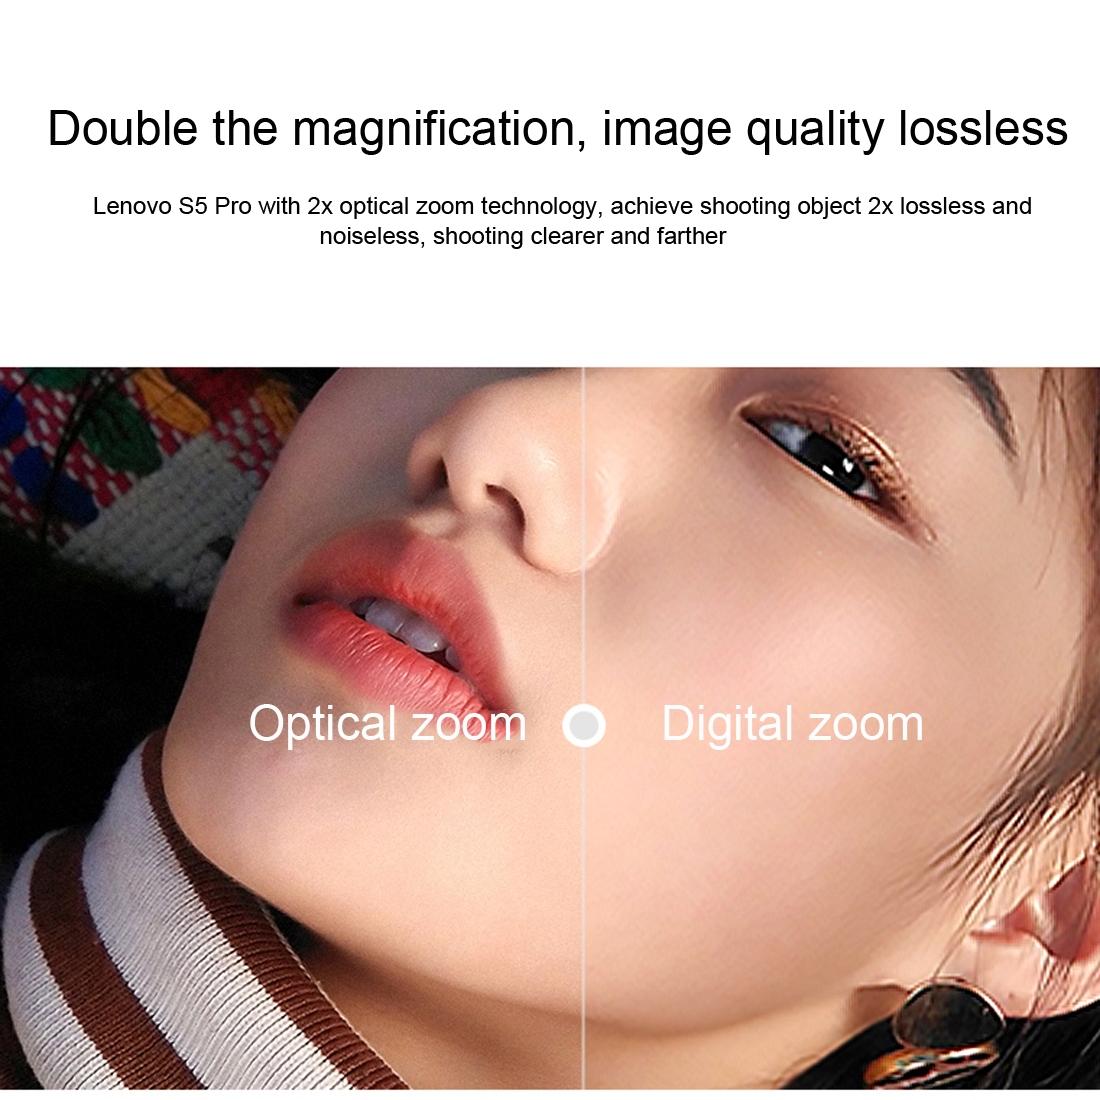 i.ibb.co/2g43Tpj/Smartphone-Celular-6-GB-RAM-64-GB-ROM-Lenovo-S5-Pro-12.jpg